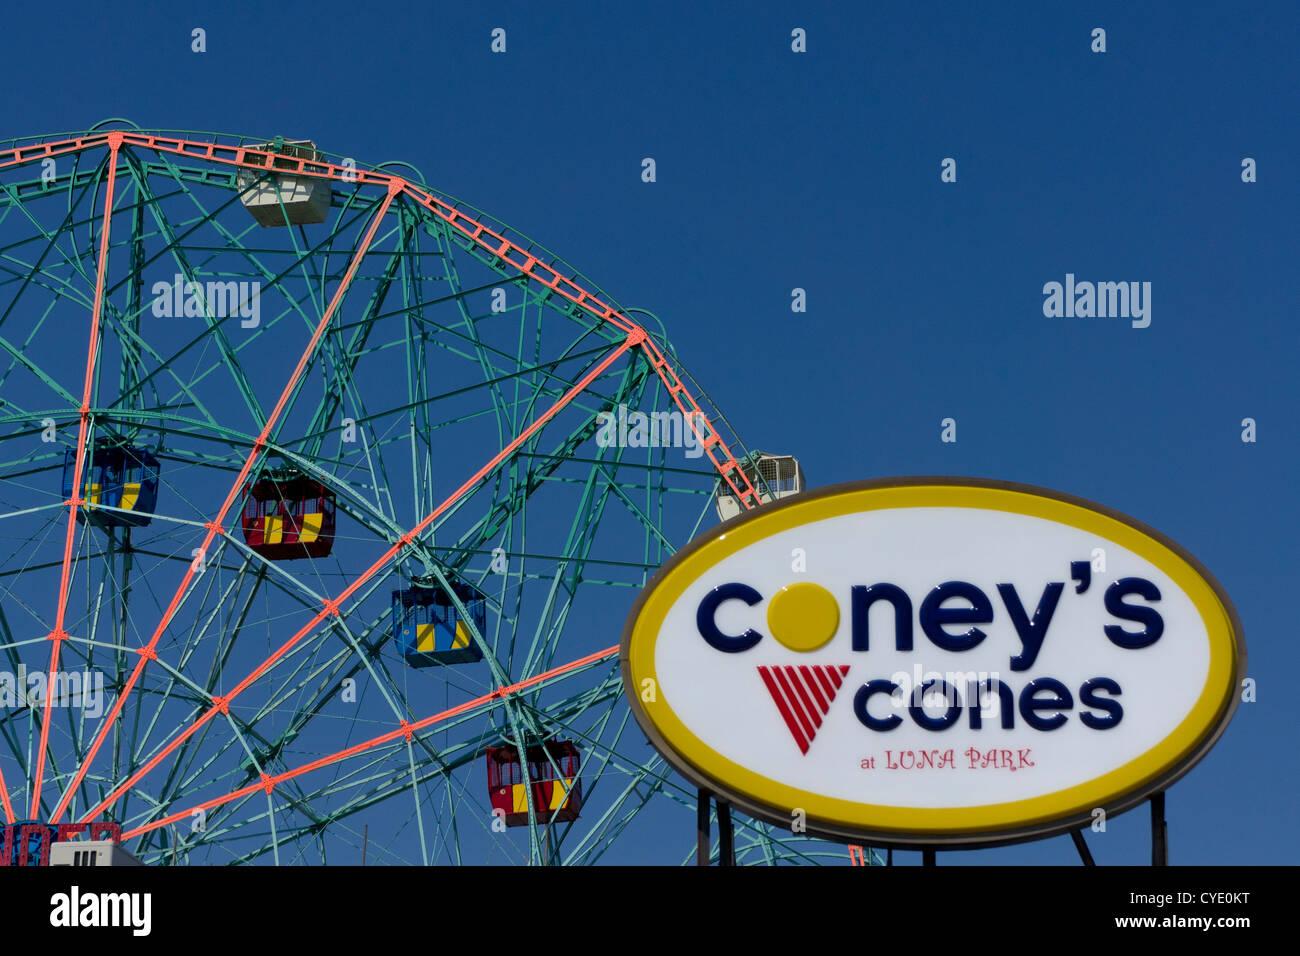 Wonder wheel in Astroland amusement park on Coney Island, with boardwalk ice cream shop sign, New York, New York, - Stock Image